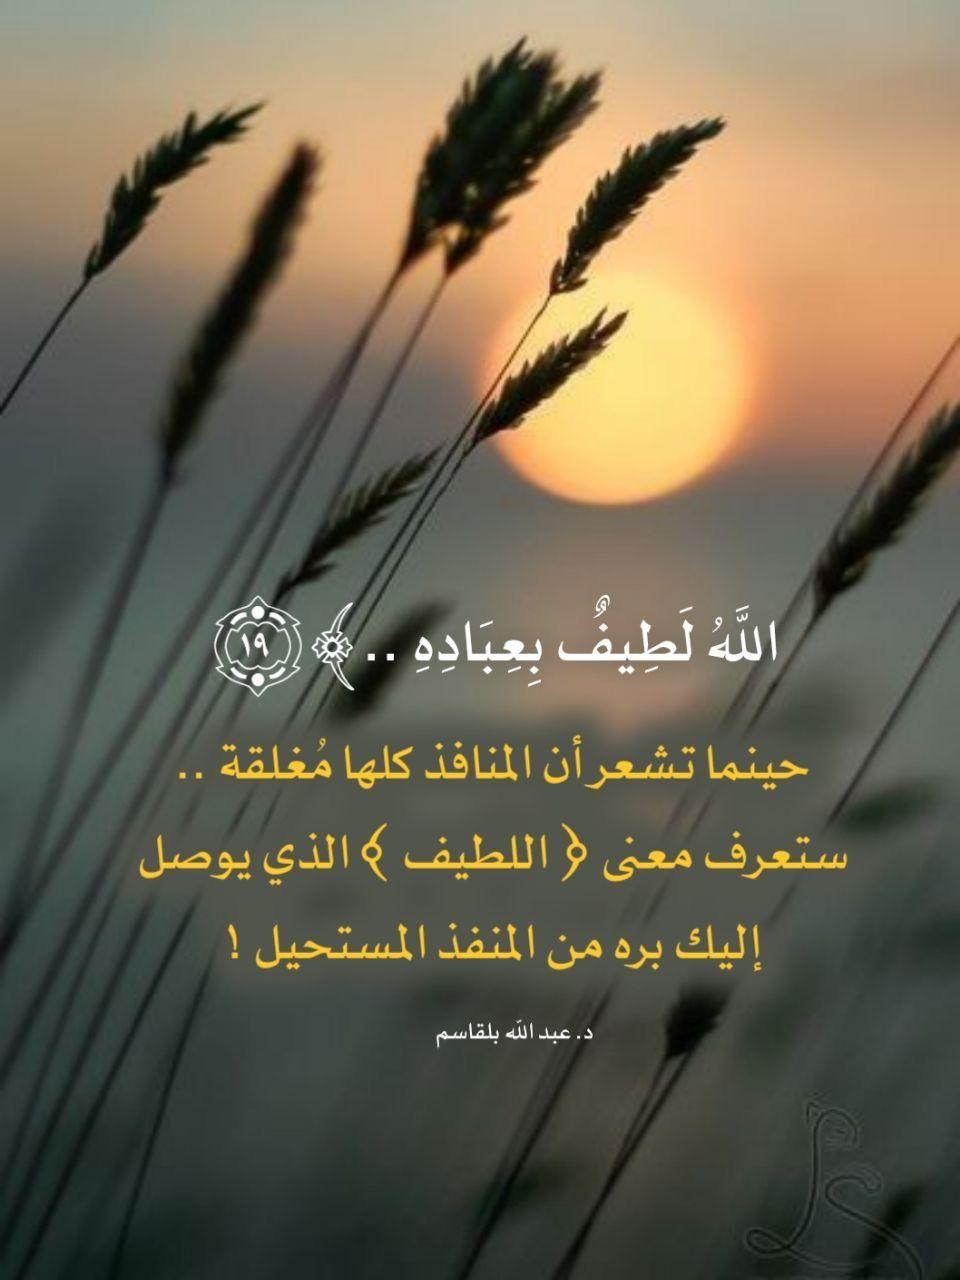 Pin By Fazia Aliazouaou On تدبرات Quran Verses Sweet Quotes Beautiful Islamic Quotes